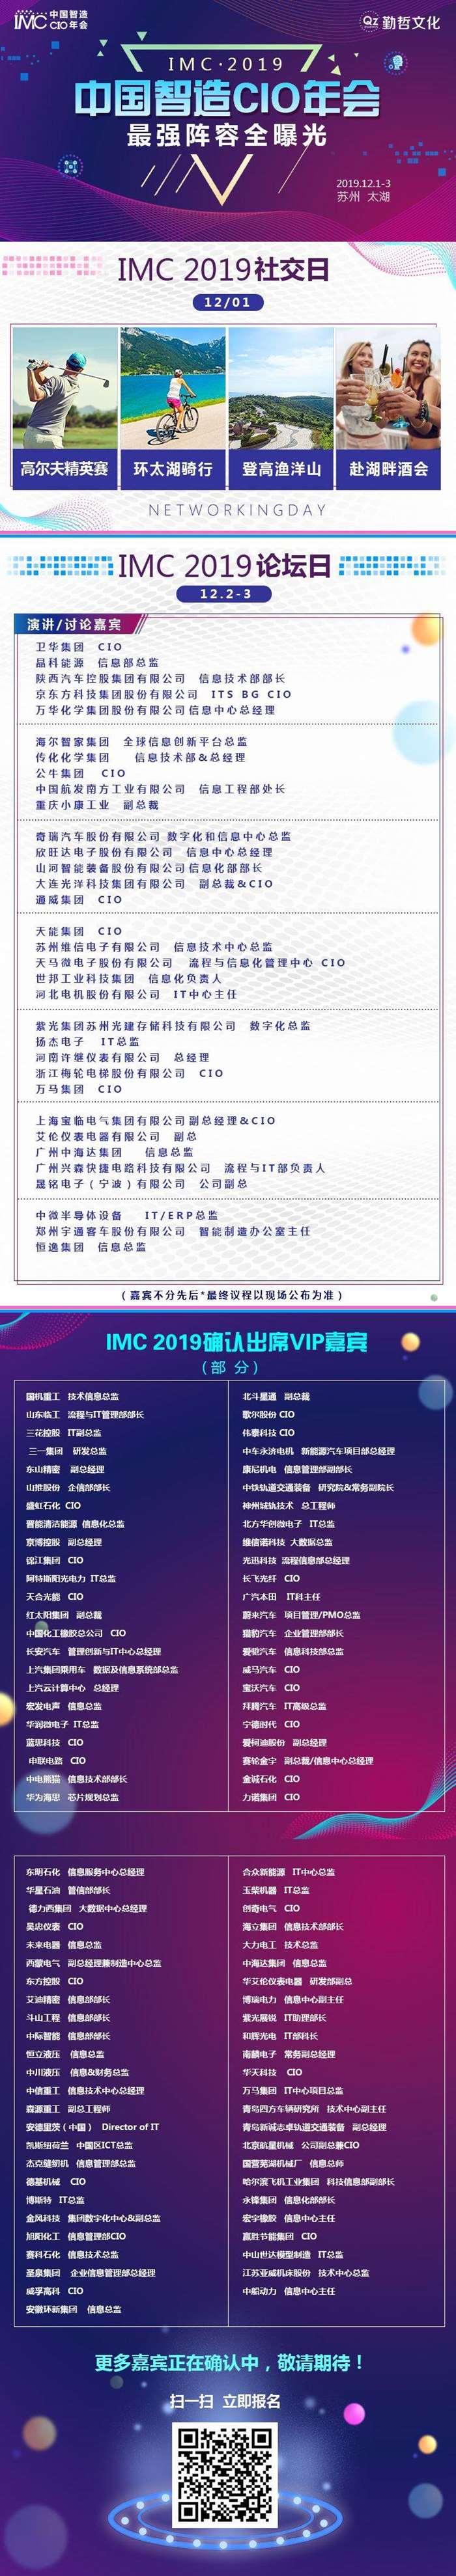 IMC-嘉宾揭晓-3(1).jpg